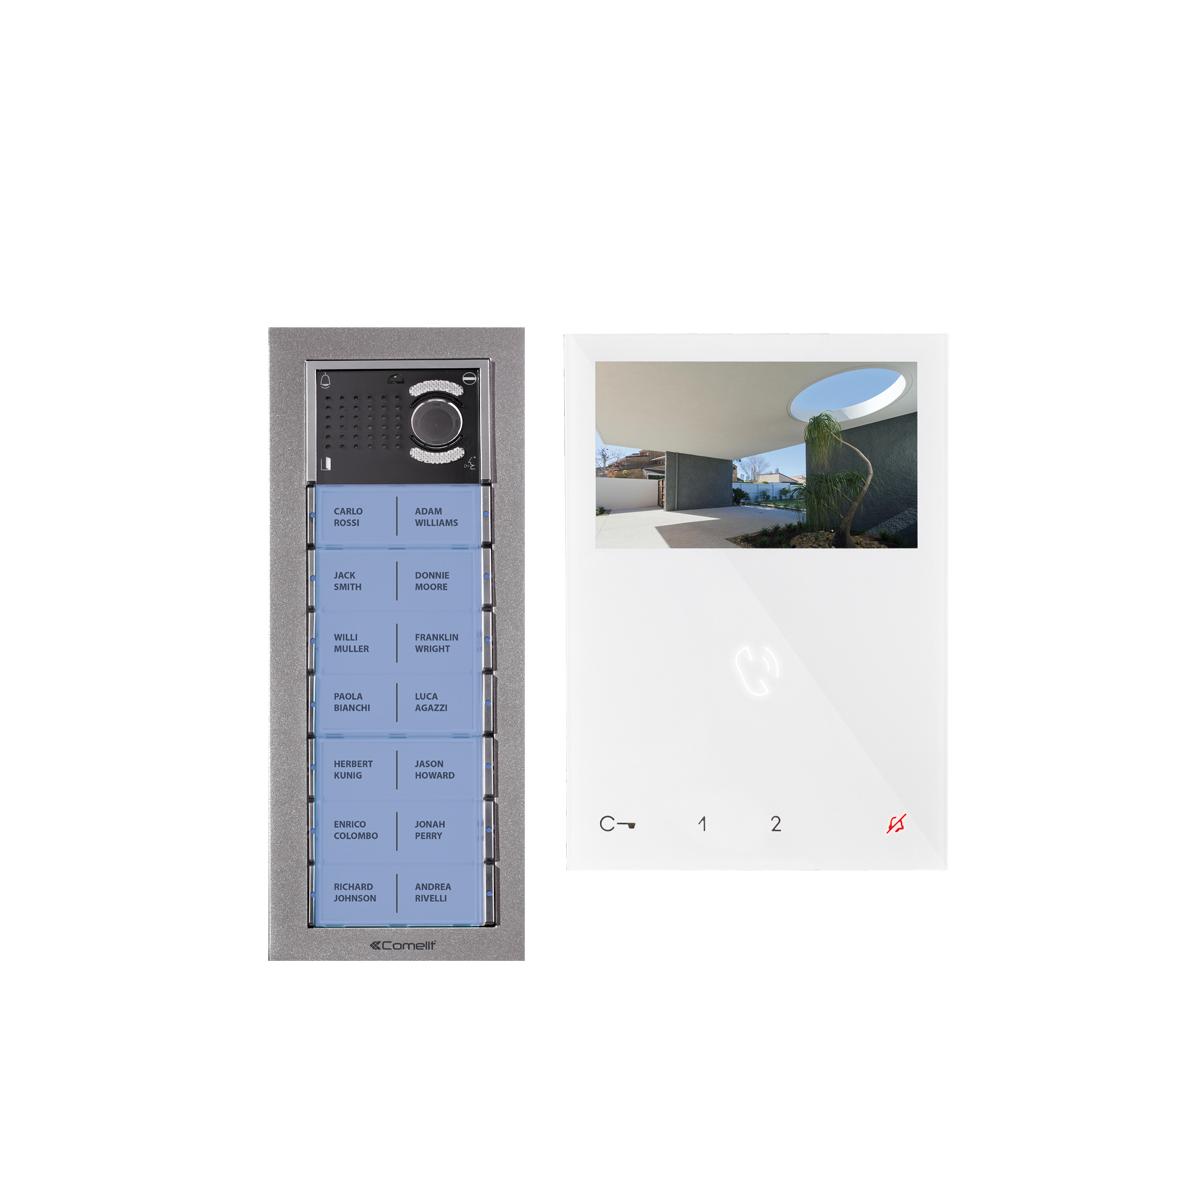 Kit Video 2 Fios Alta Voz - 15 Apartamentos